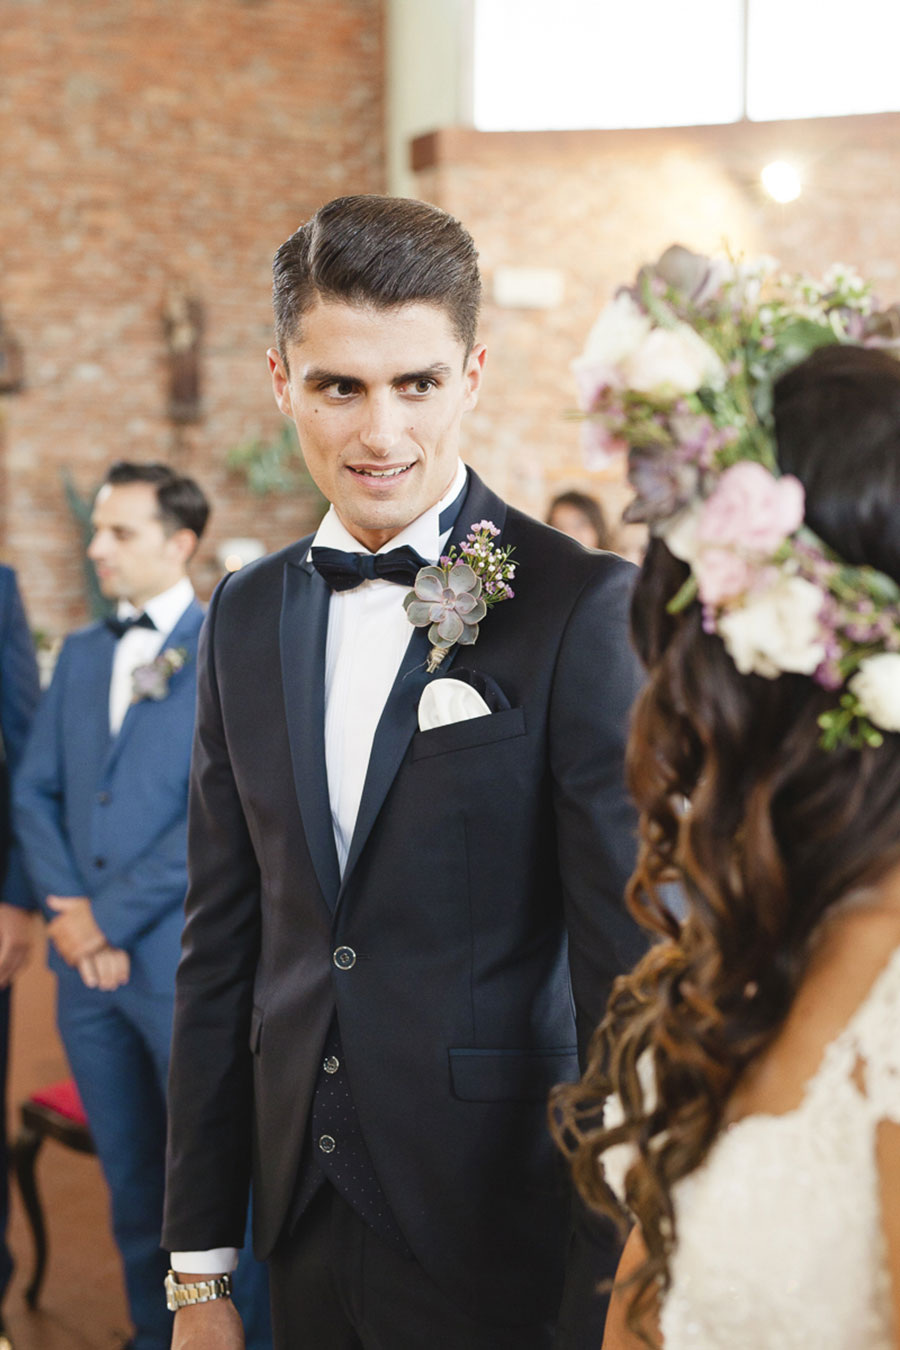 Wedding-Nicholad-and-Federica-Giuseppe-Giovannelli-141